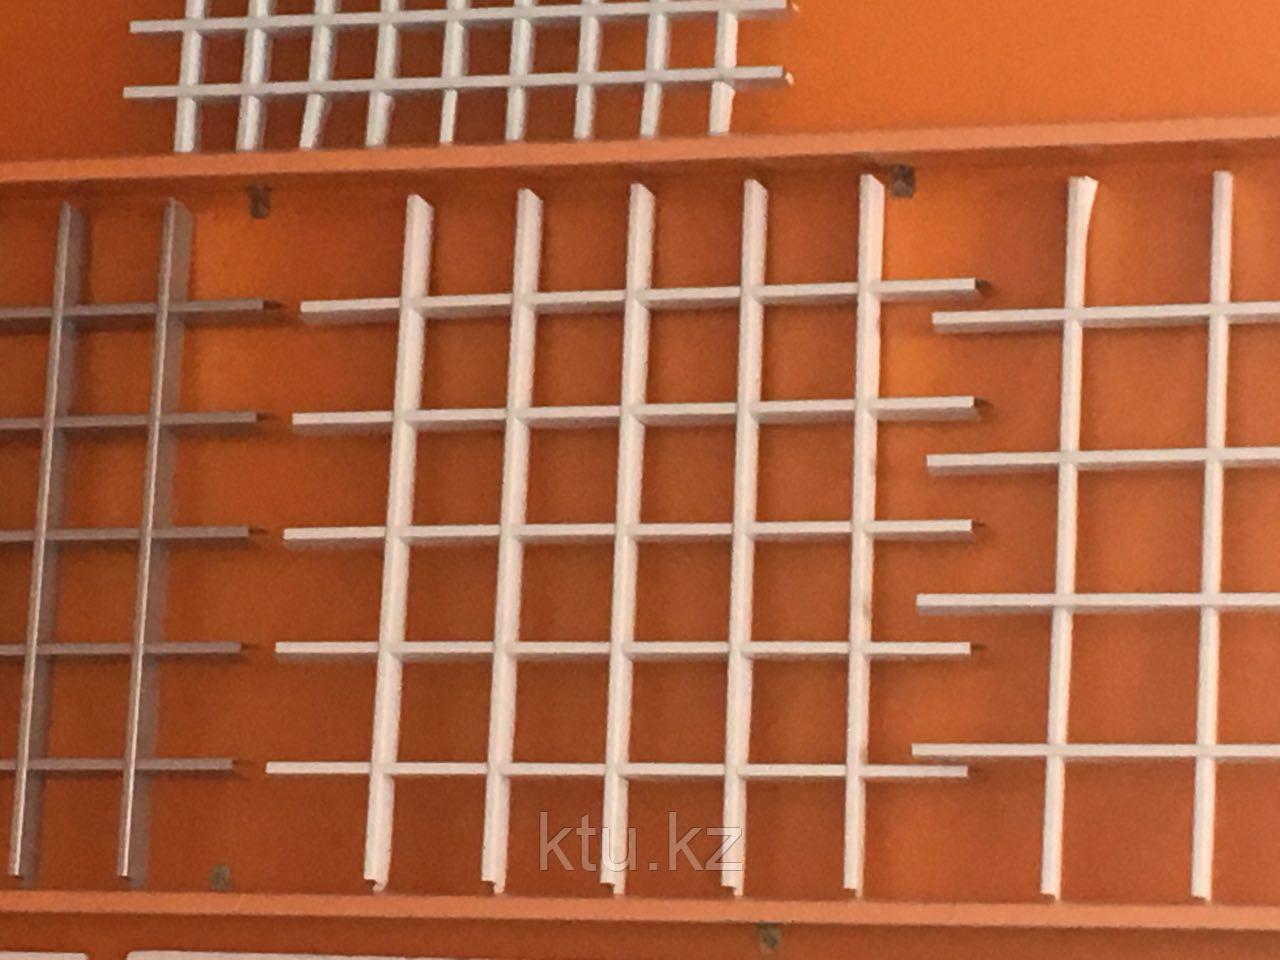 Потолок Албес Grigliato 120*120 проф 2,4 белый мат